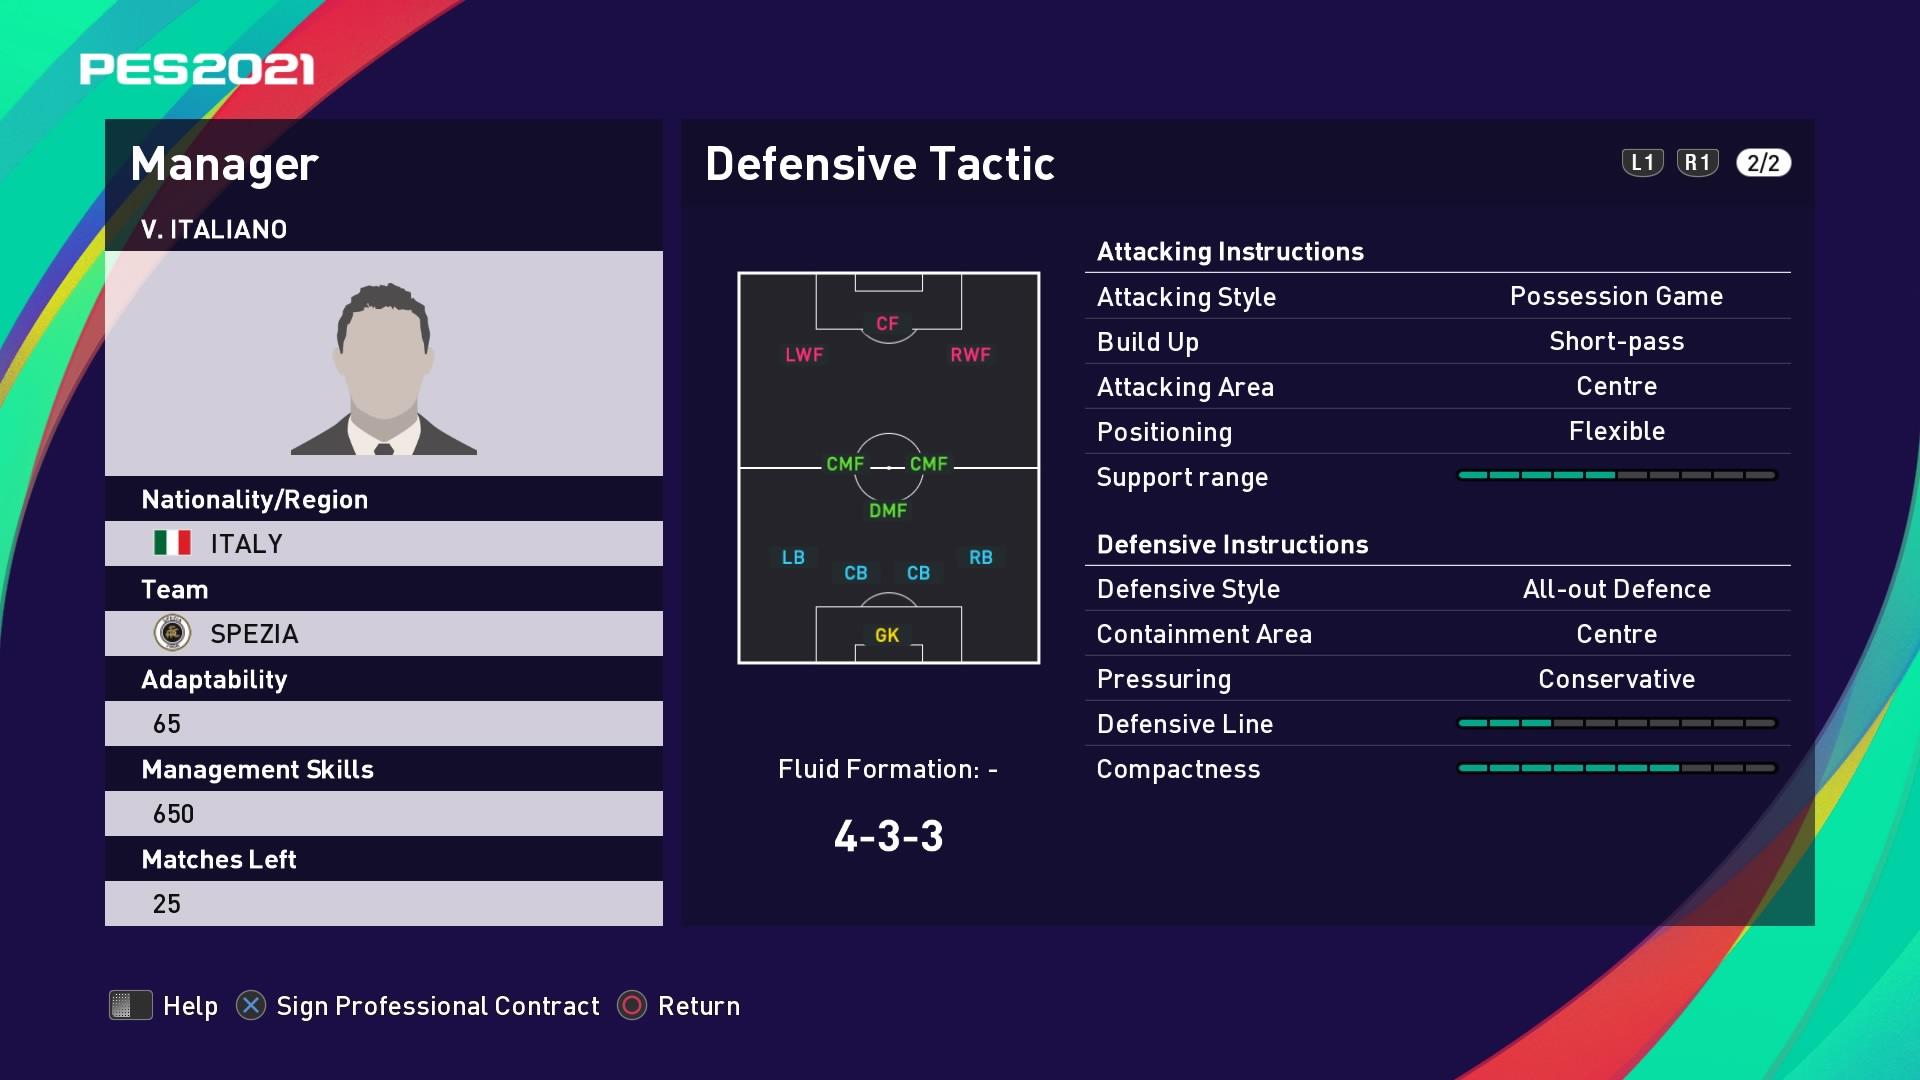 V. Italiano (Vincenzo Italiano) Defensive Tactic in PES 2021 myClub